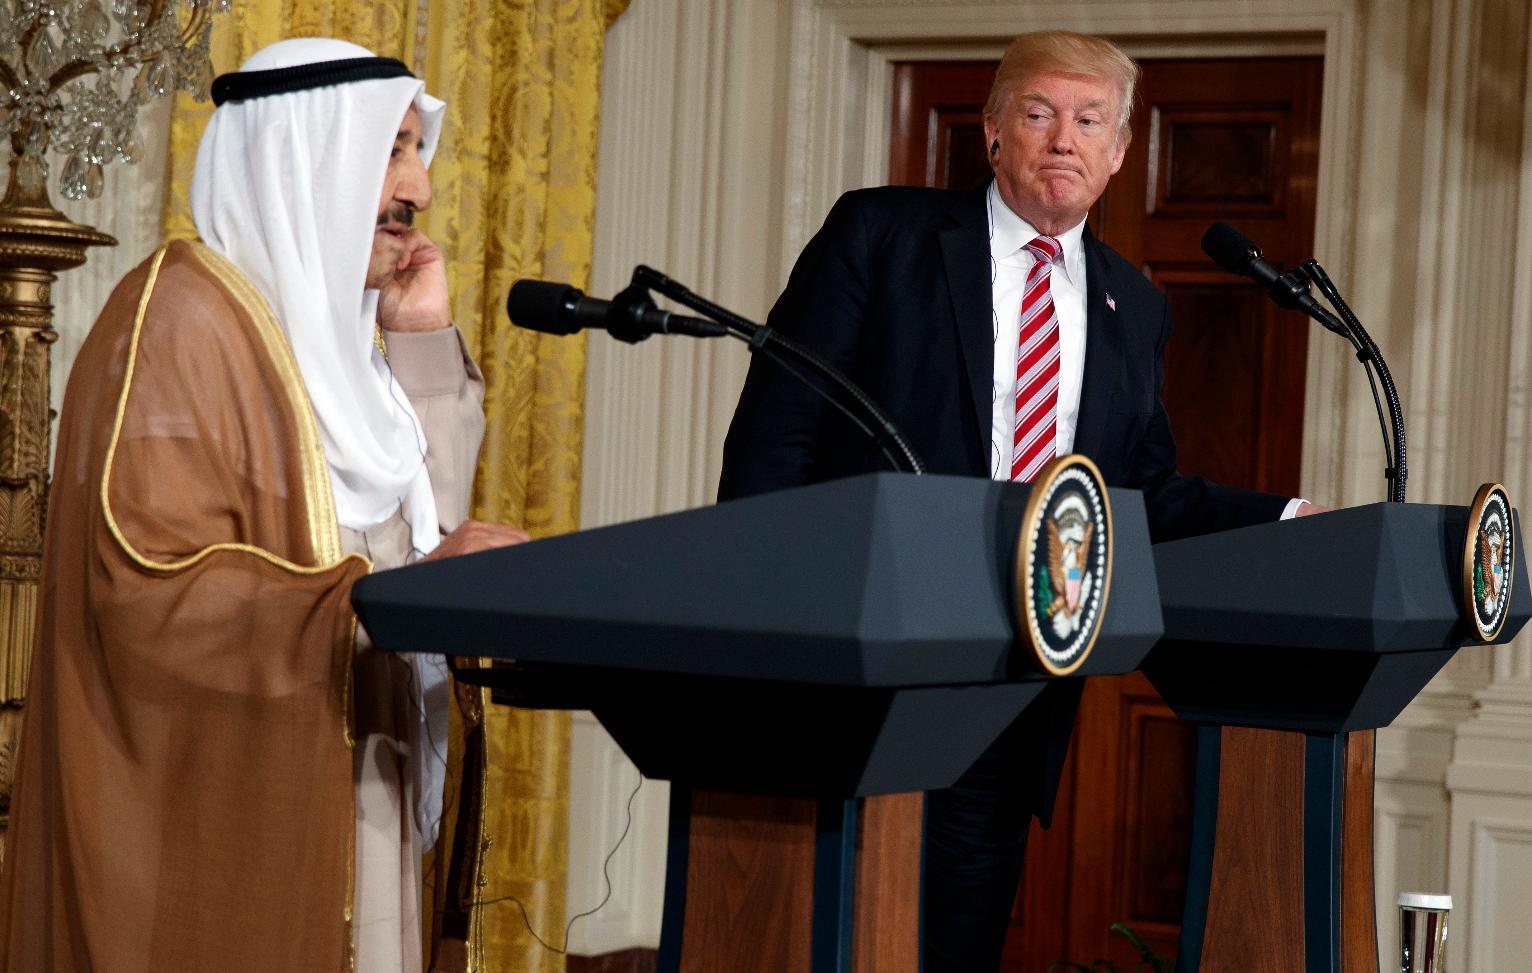 media ade0a1c215b84bcb9a5f168e131ea2b1Trump_US_Kuwait_74409